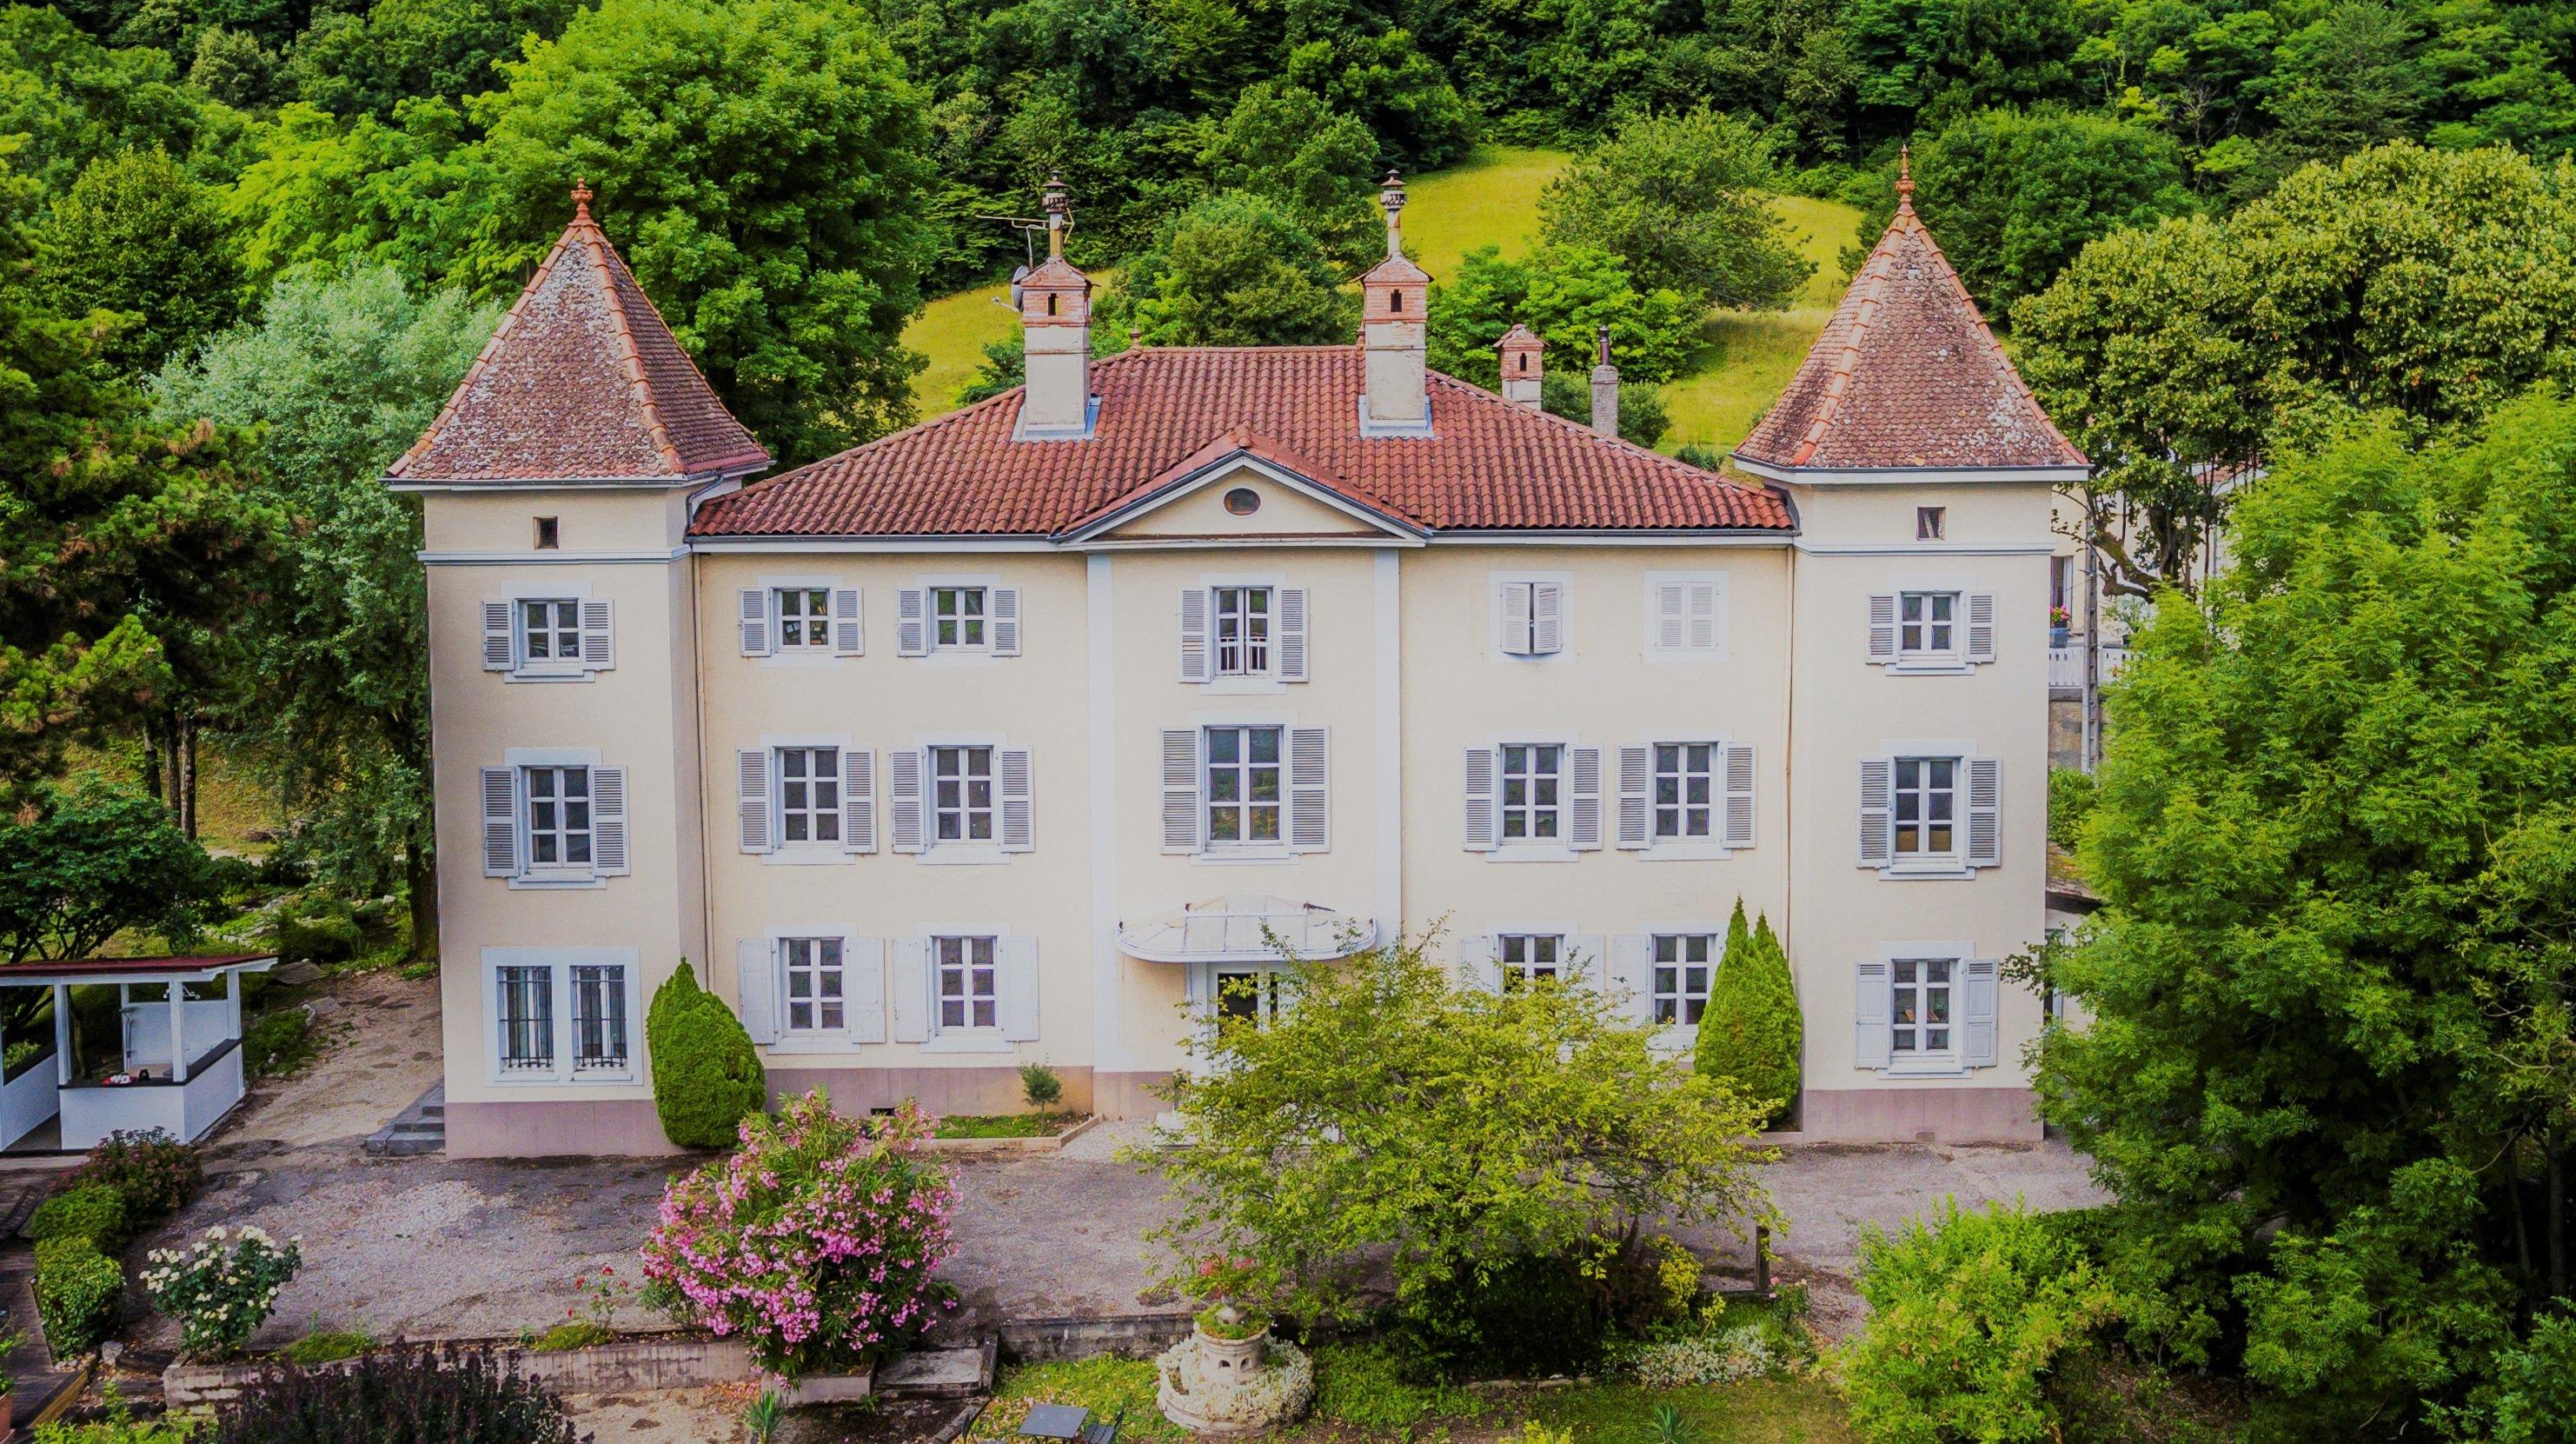 Chateau de Chaulnes-news1.jpg